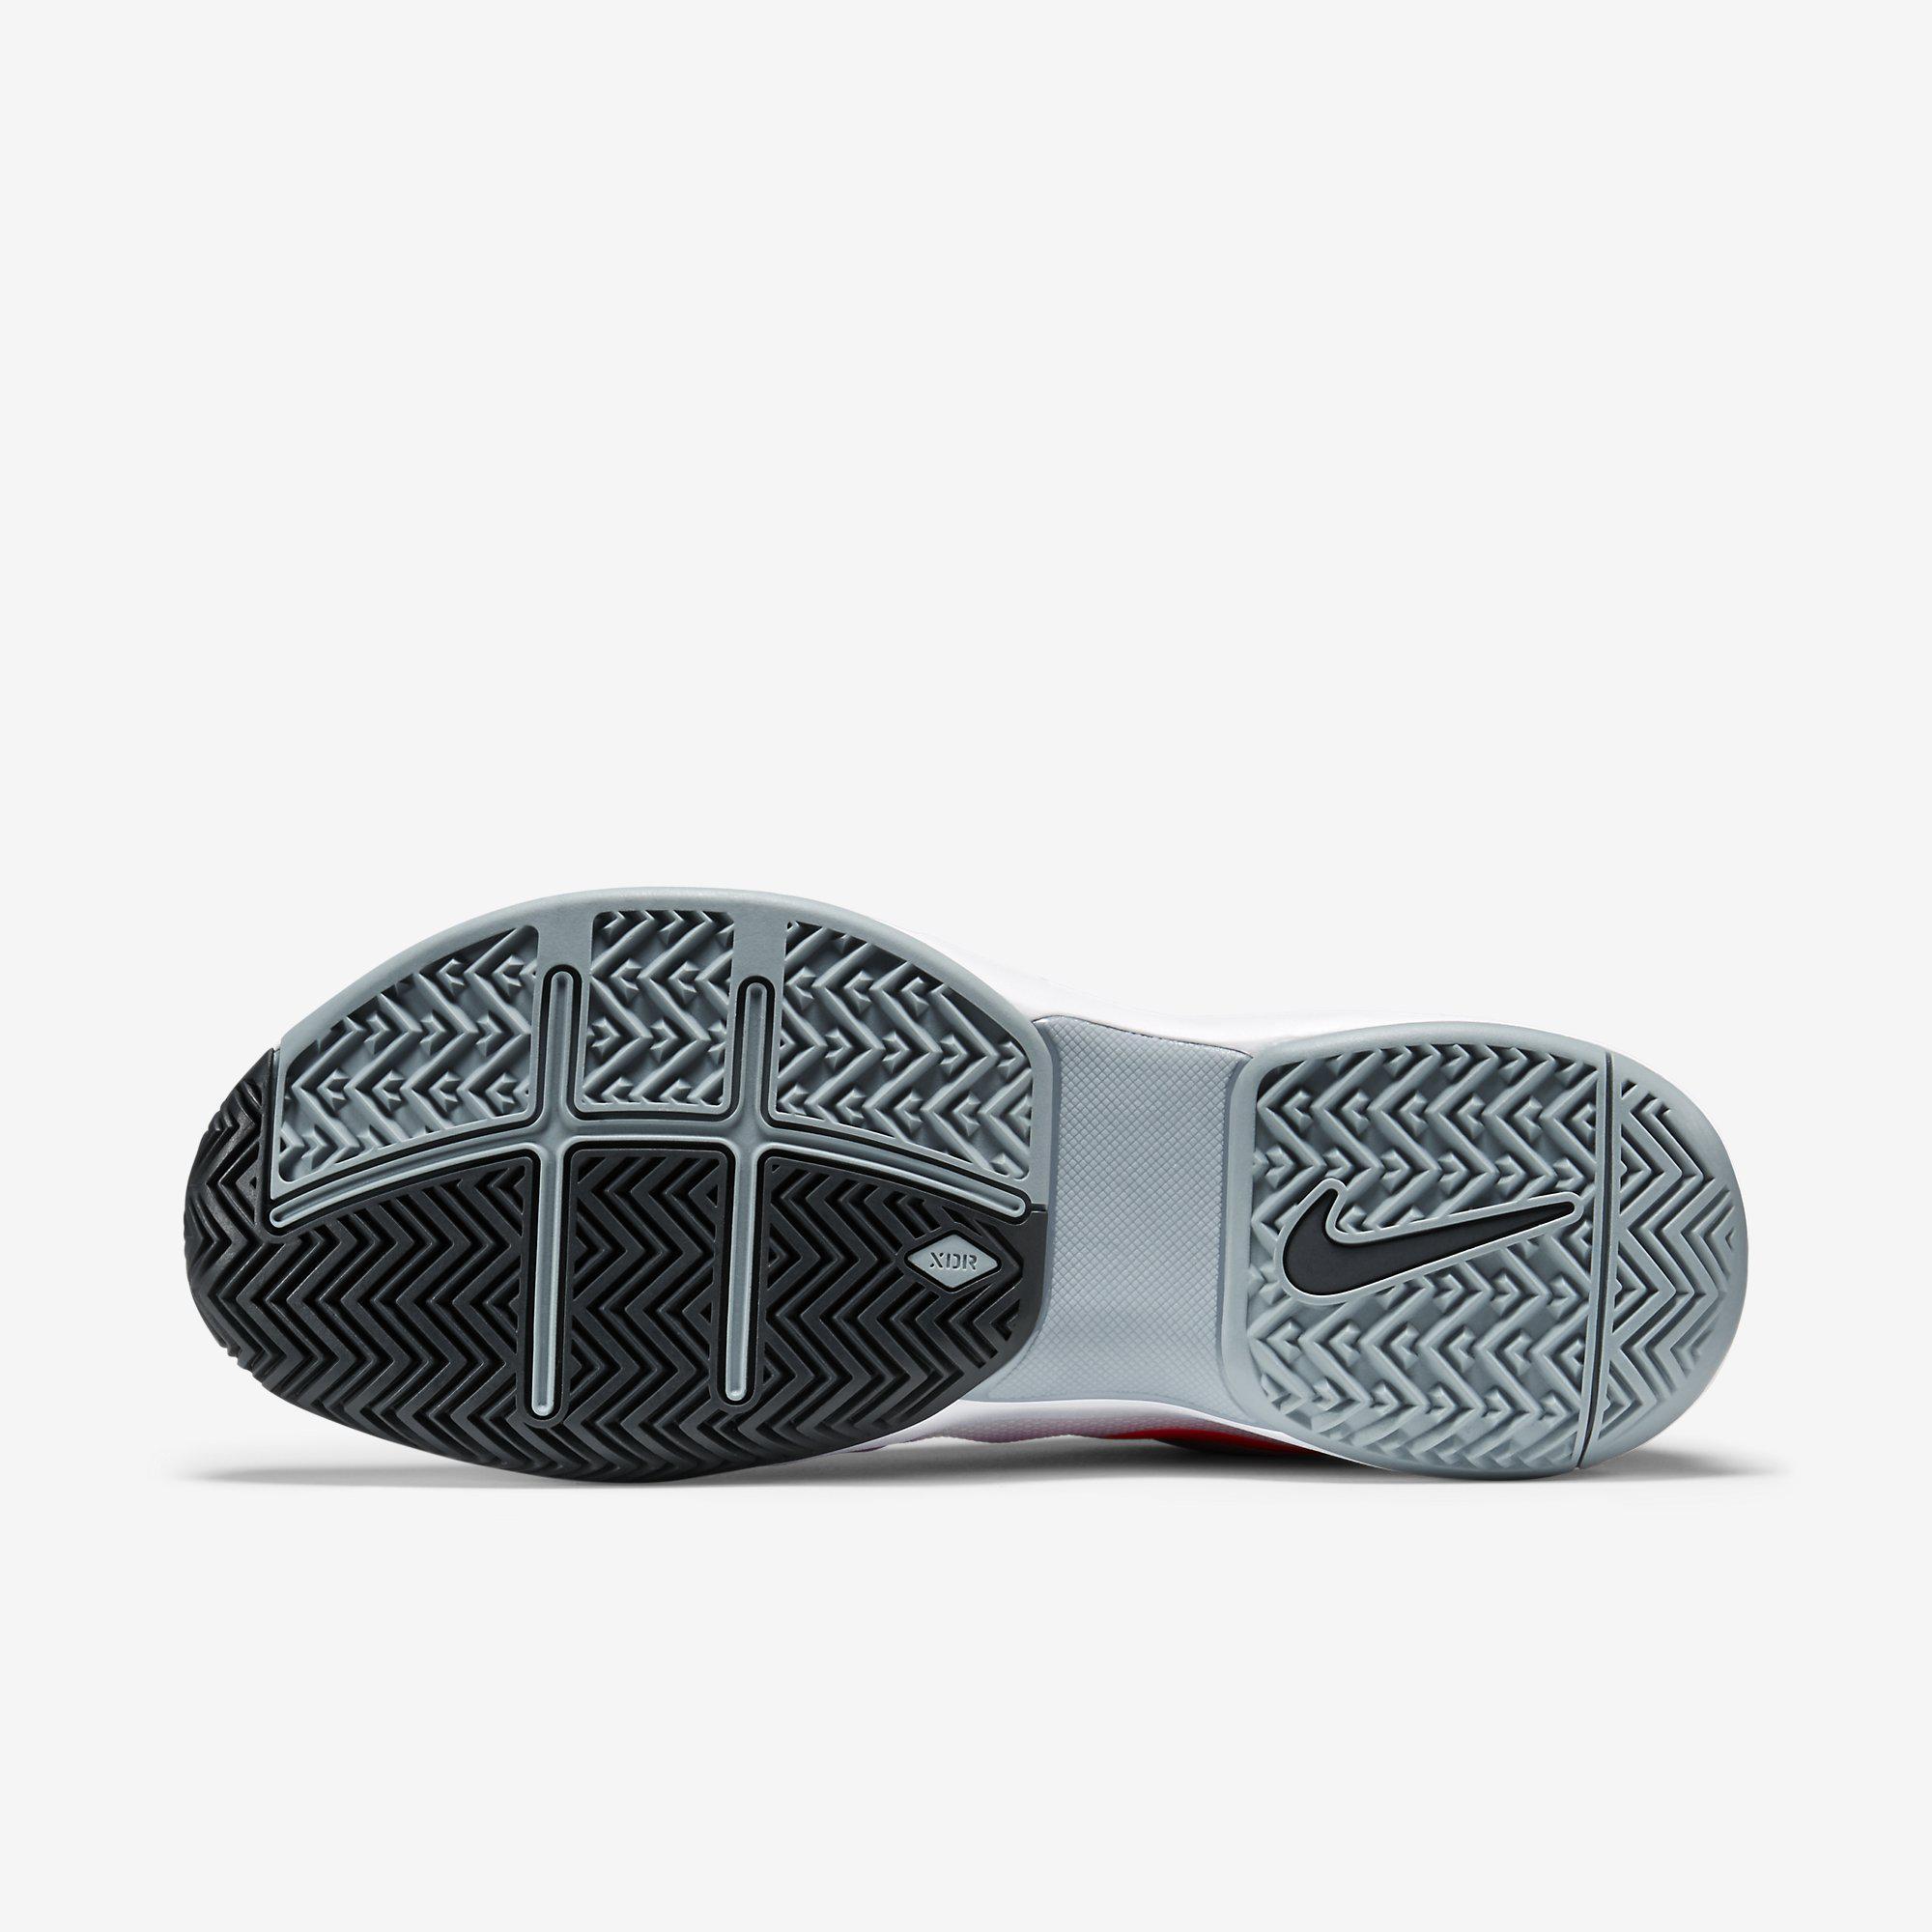 75e4dcb06abb Nike Womens Zoom Vapor 9.5 Tennis Shoes - Fuchsia Glow Dove Grey ...